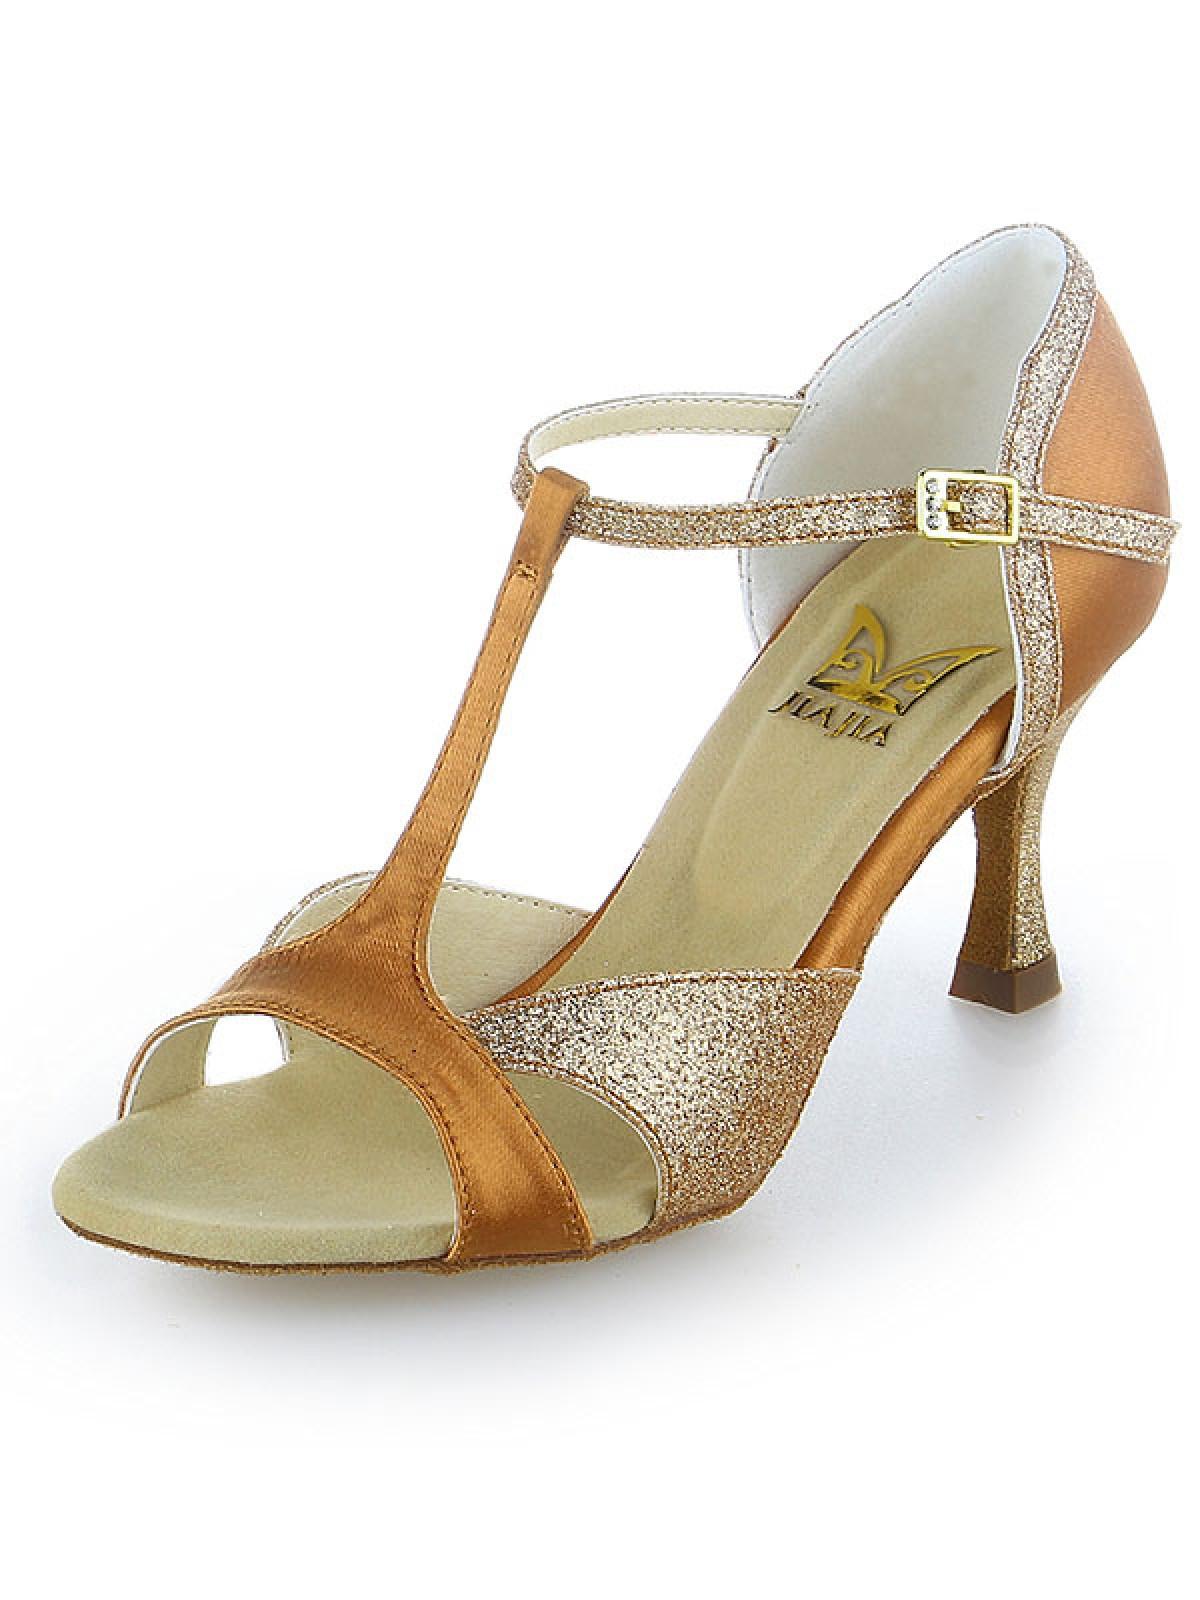 7e8ef72b707 Women s Satin Peep Toe Sparkling Glitter Stiletto Heel Dance Shoes